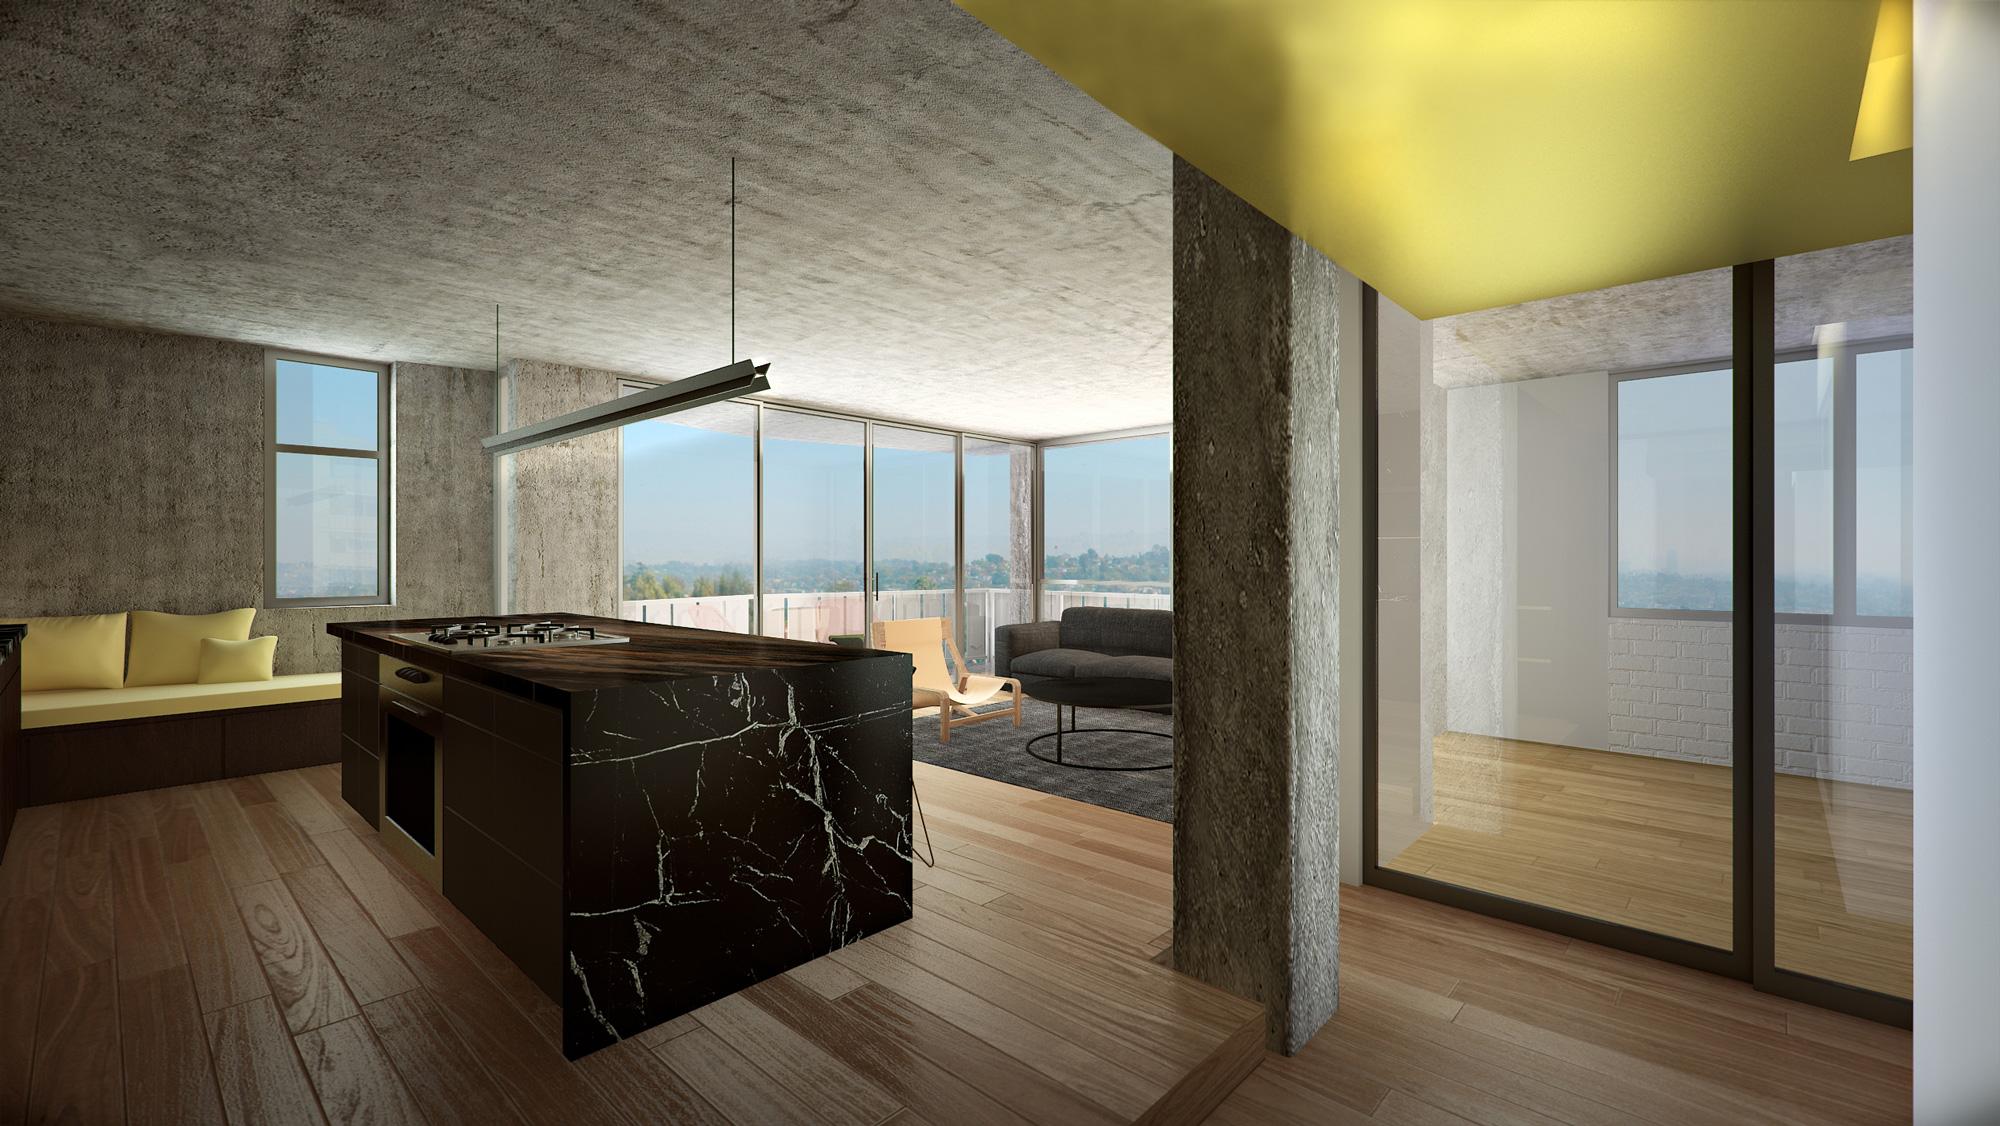 Loft 3D Rendering